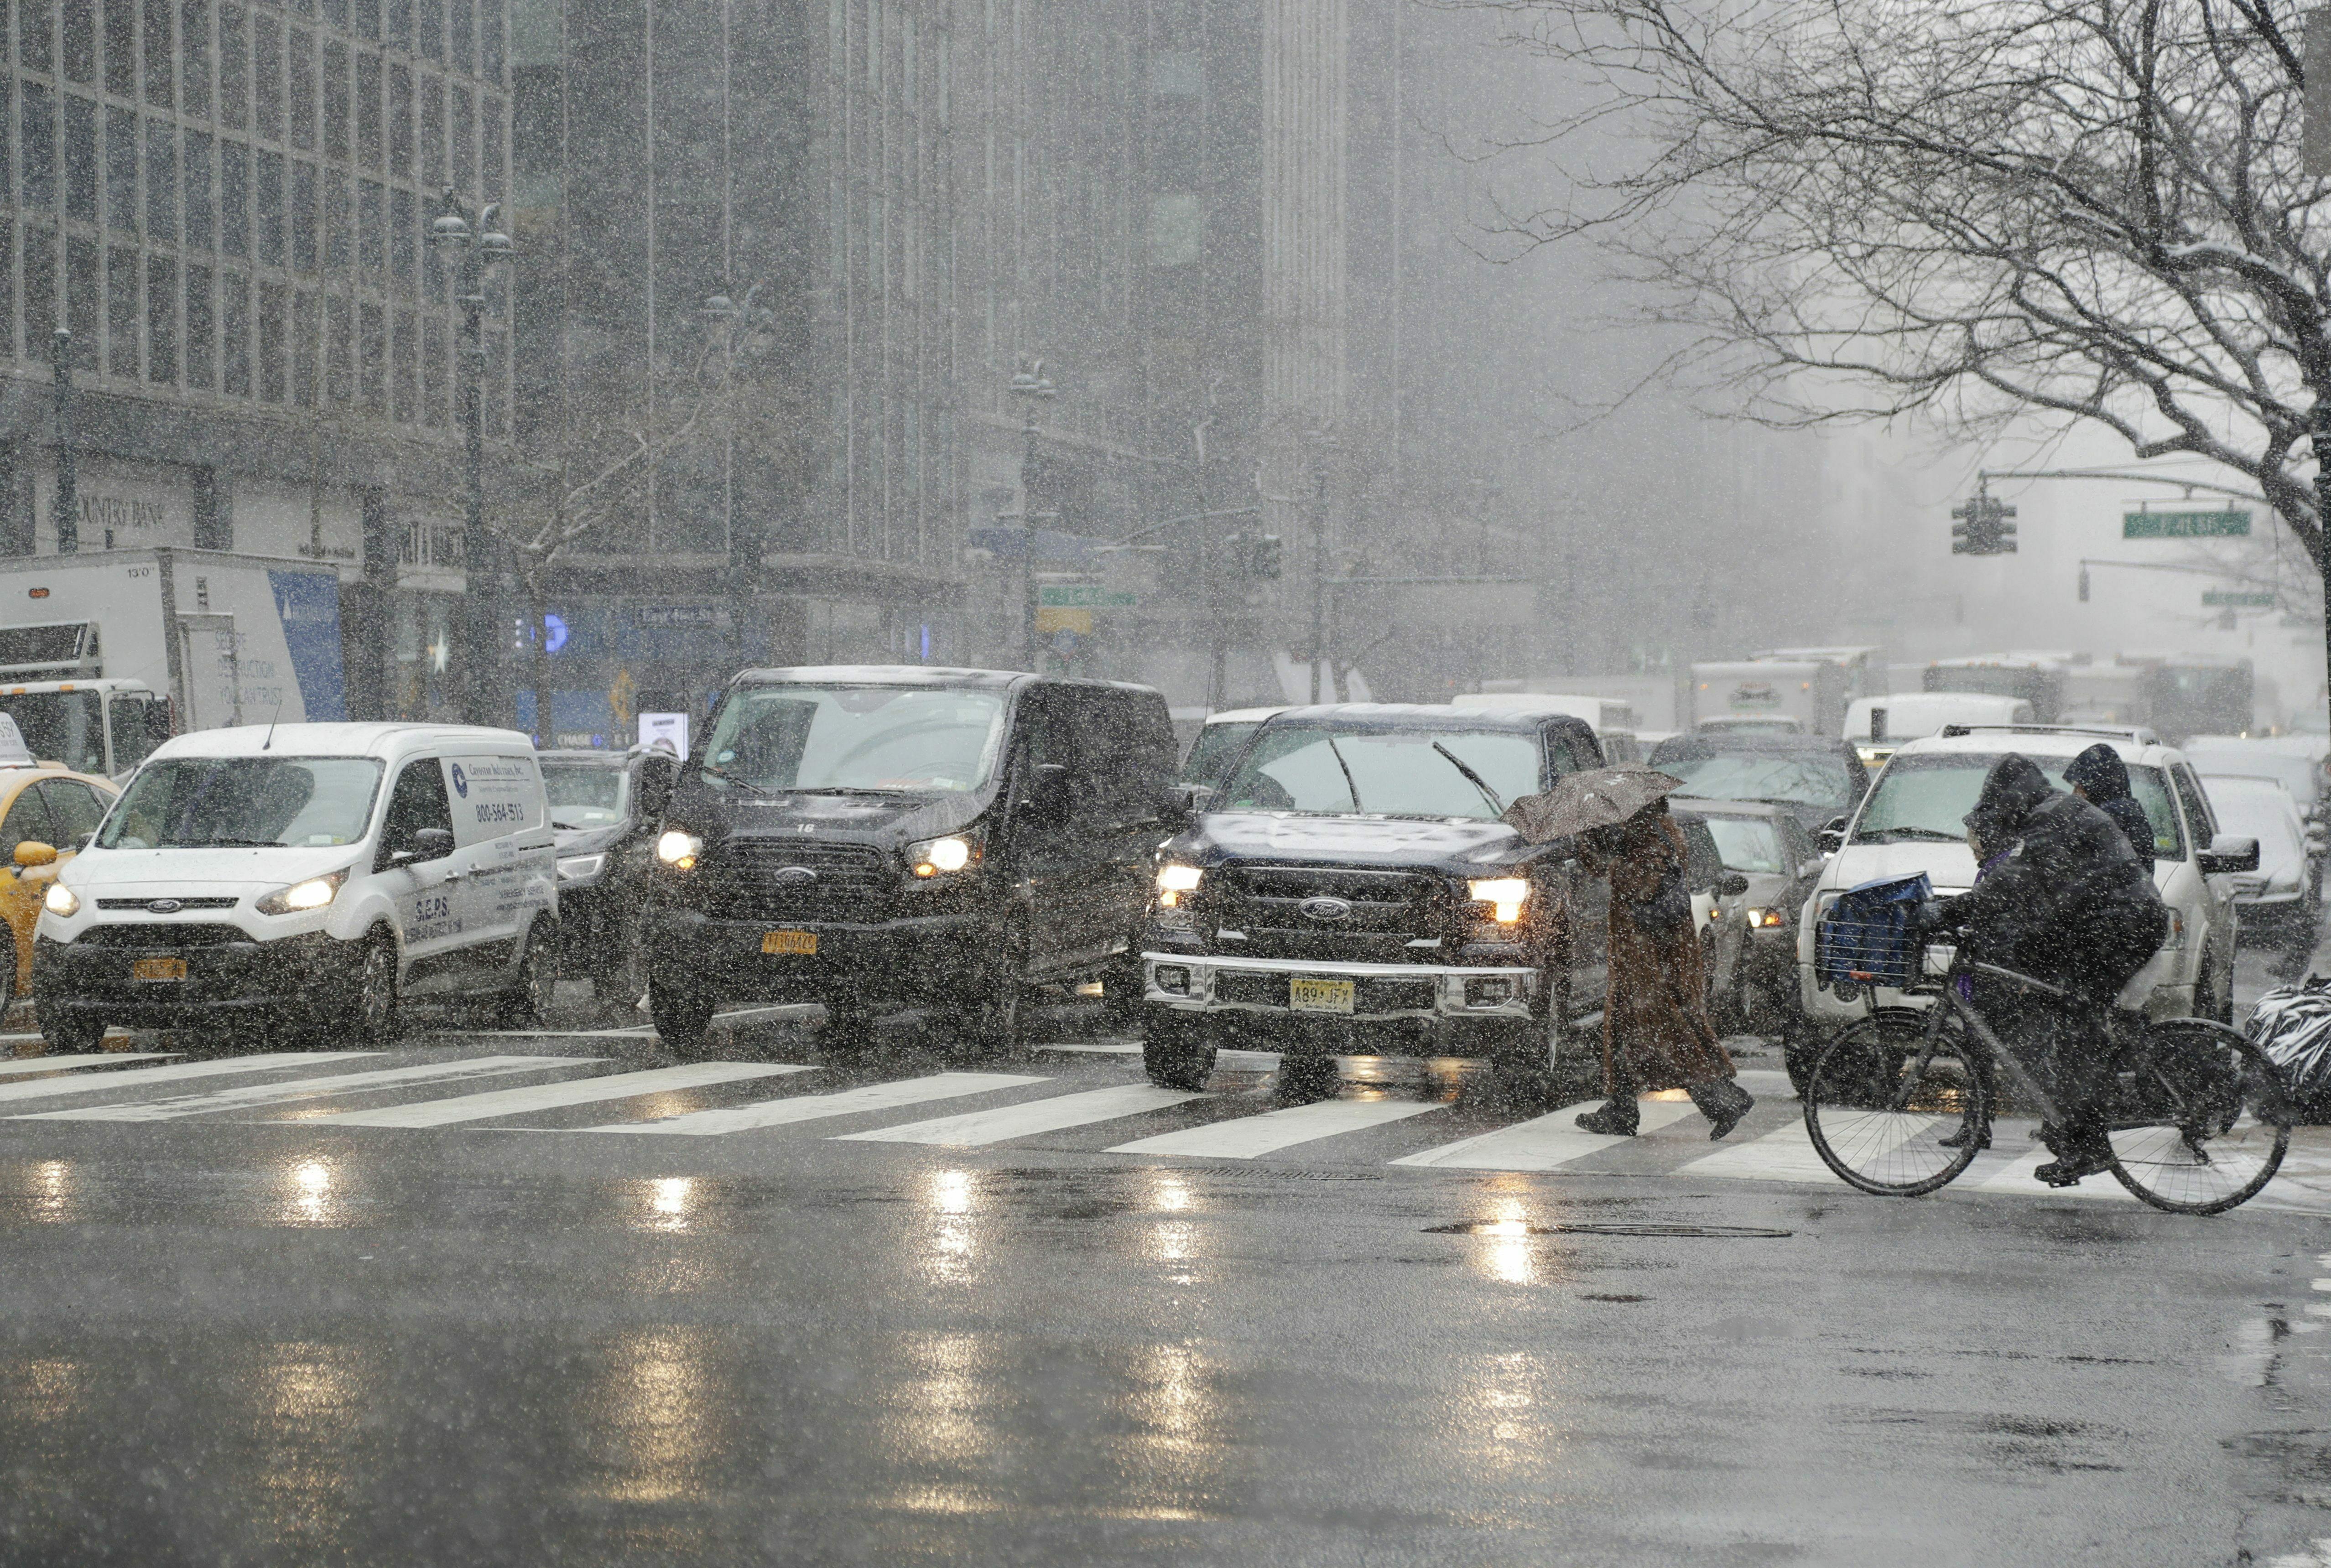 Live updates: Monster winter storm snarls travel, cancels